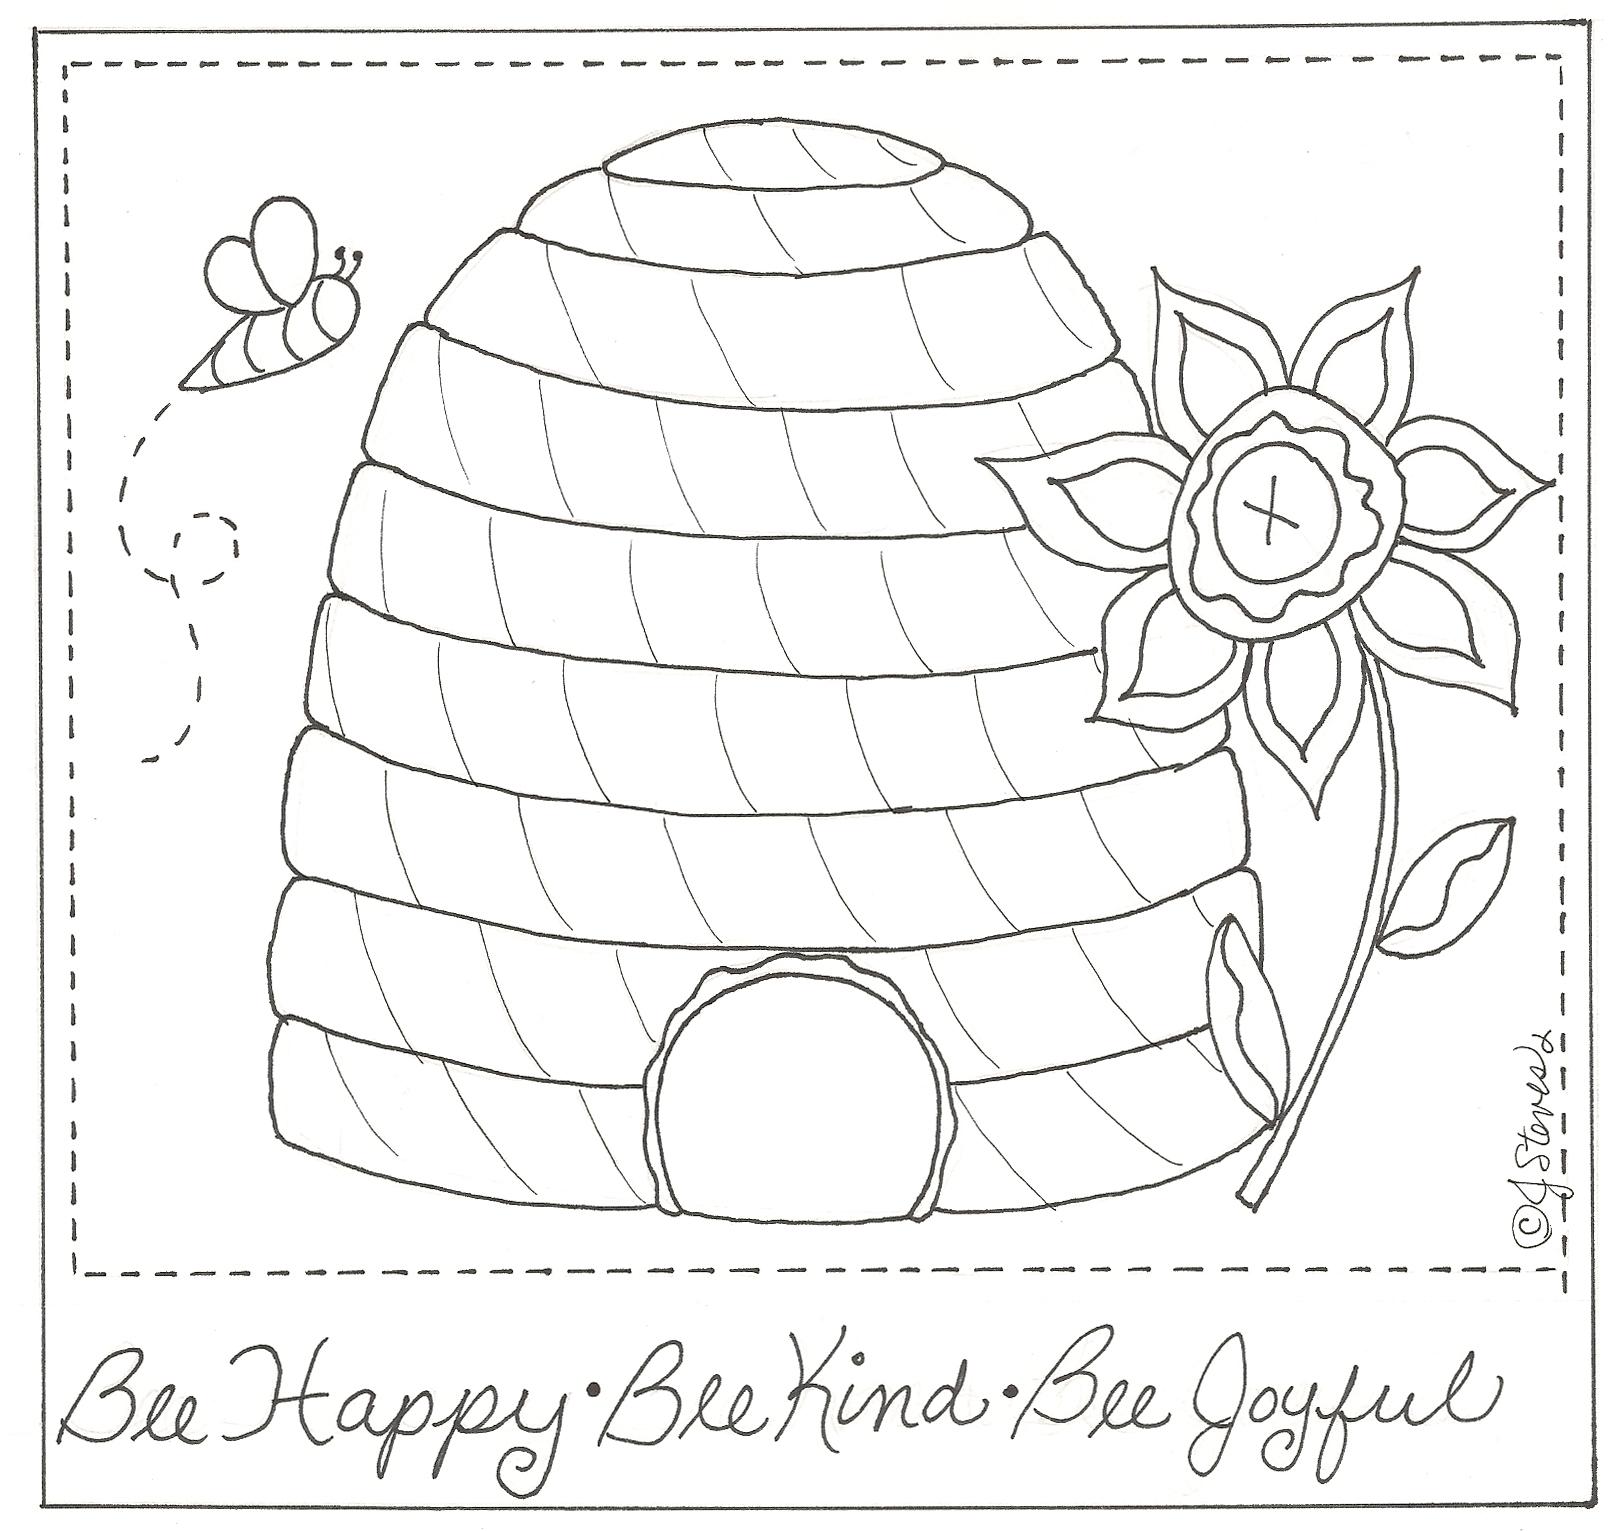 Bee Happy Stichery